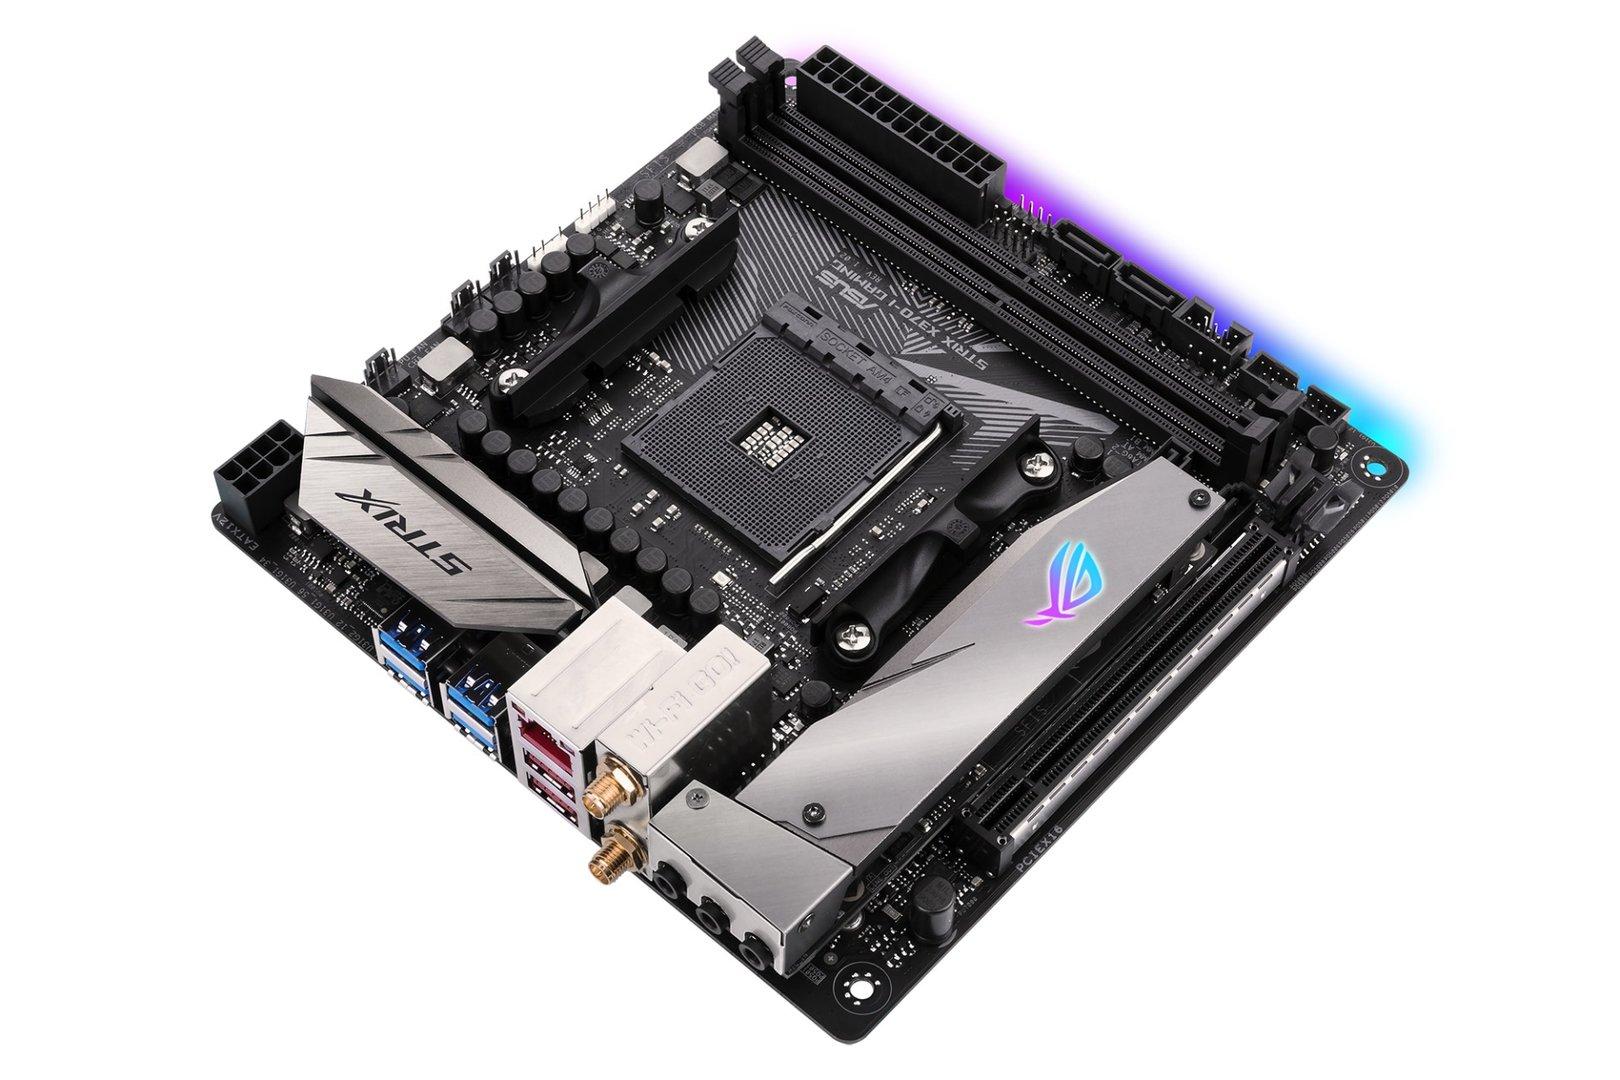 ROG Strix X370-I Gaming